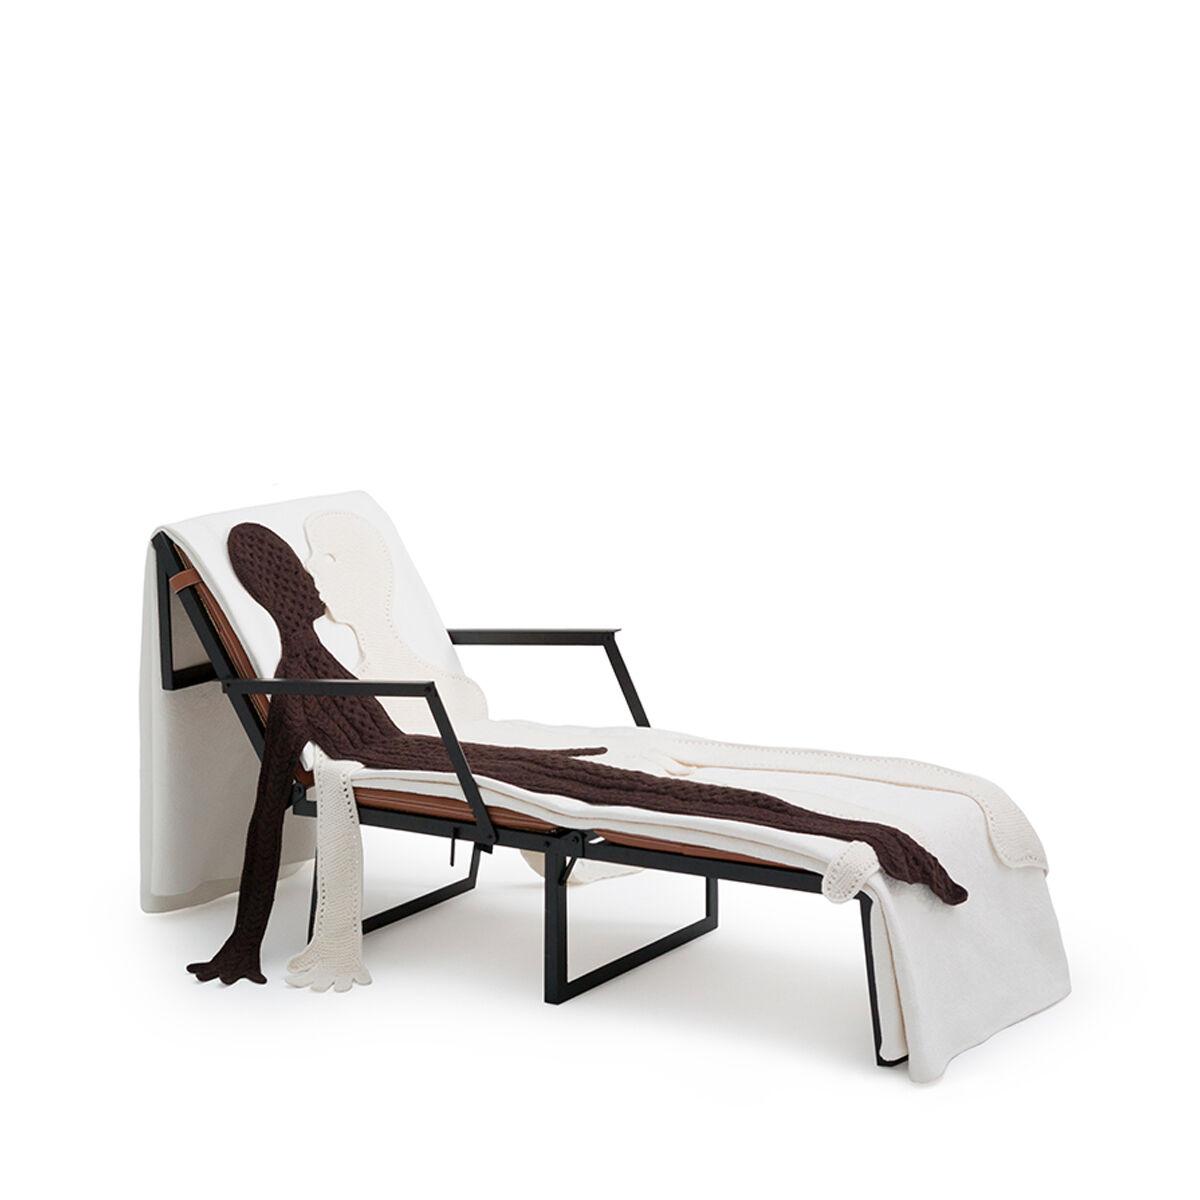 LOEWE Set Folding Chair And Figures ブラック/マルチカラー all